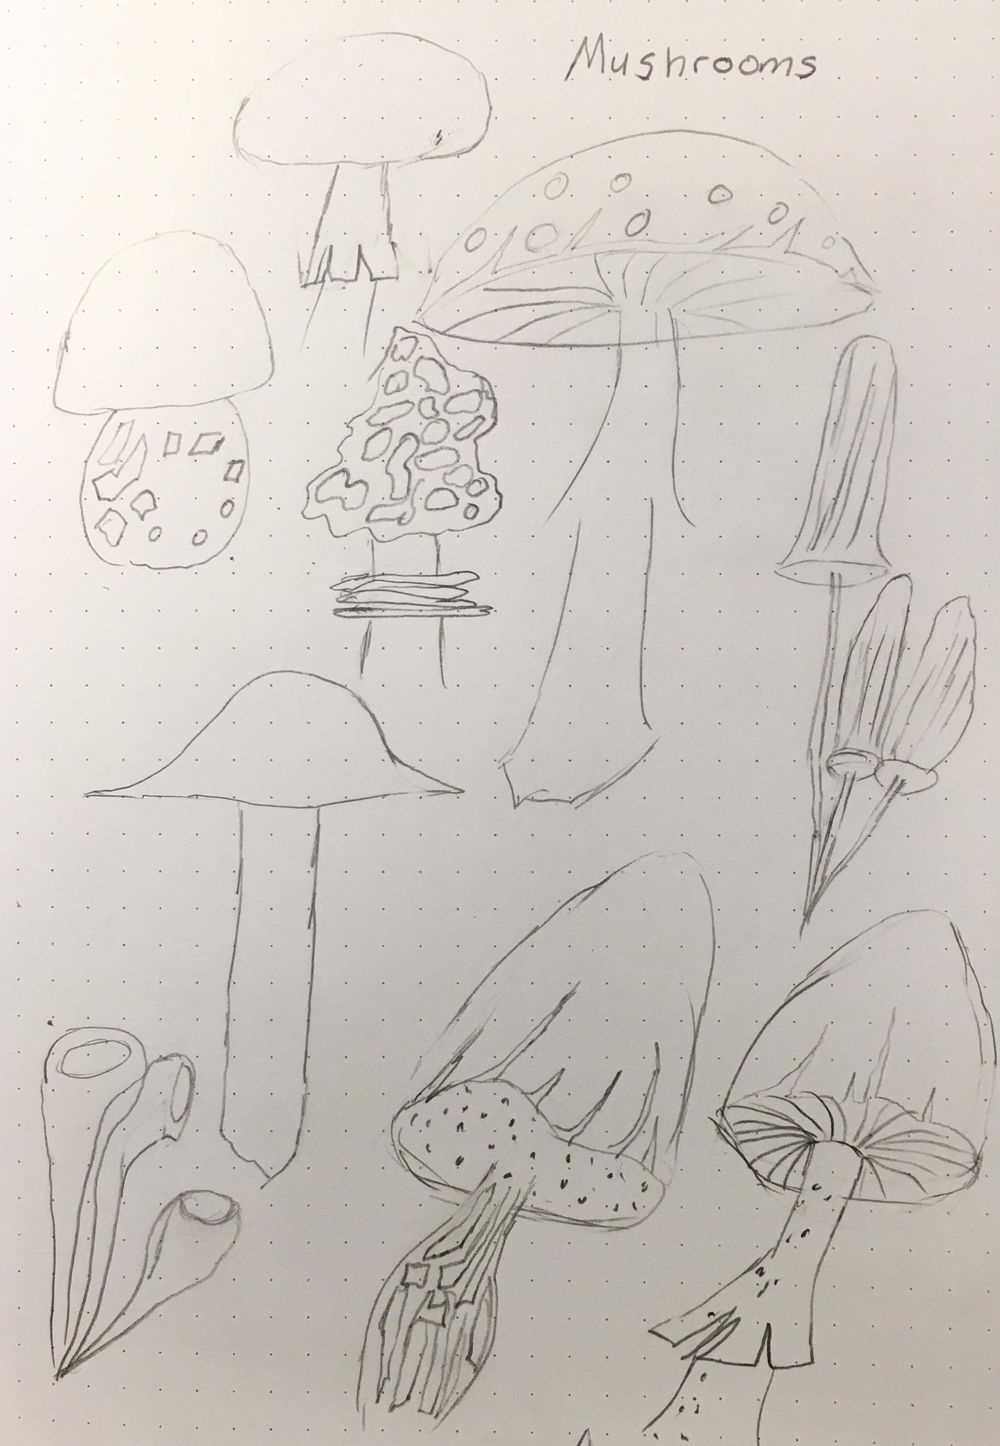 Fungi - image 1 - student project